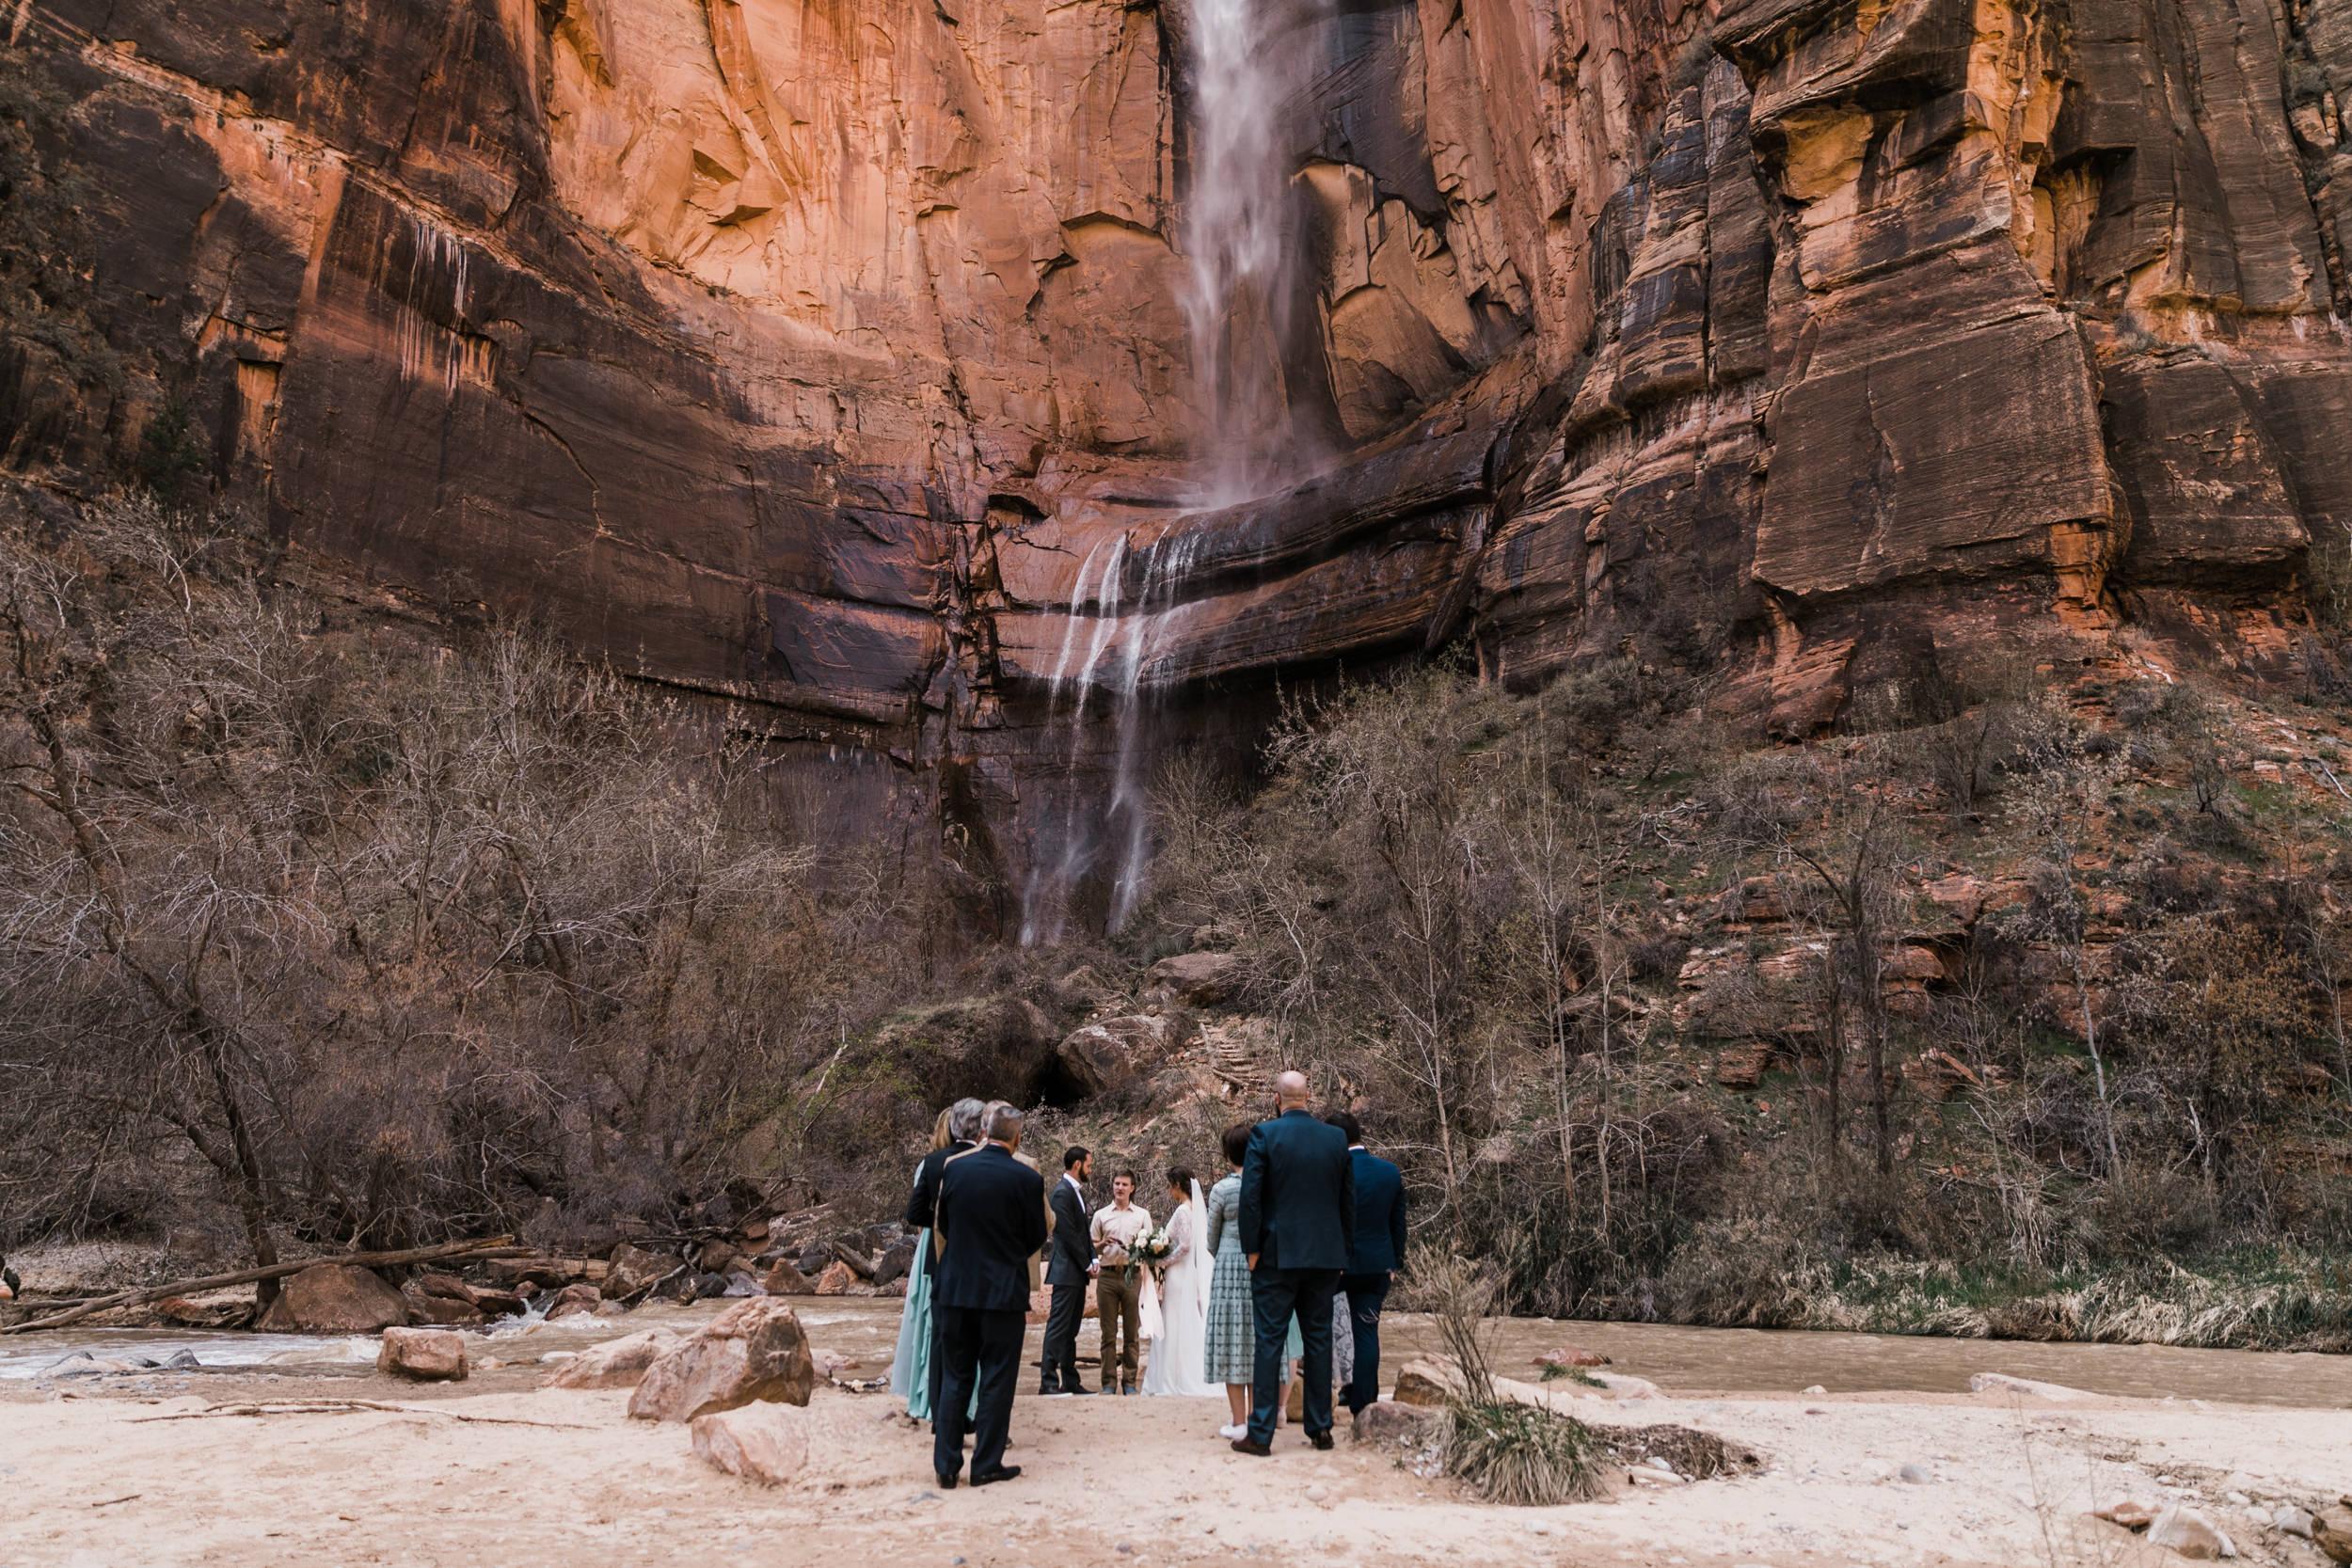 Zion-National-Park-Adventure-Wedding-Hearnes-Elopement-Photography-4.jpg